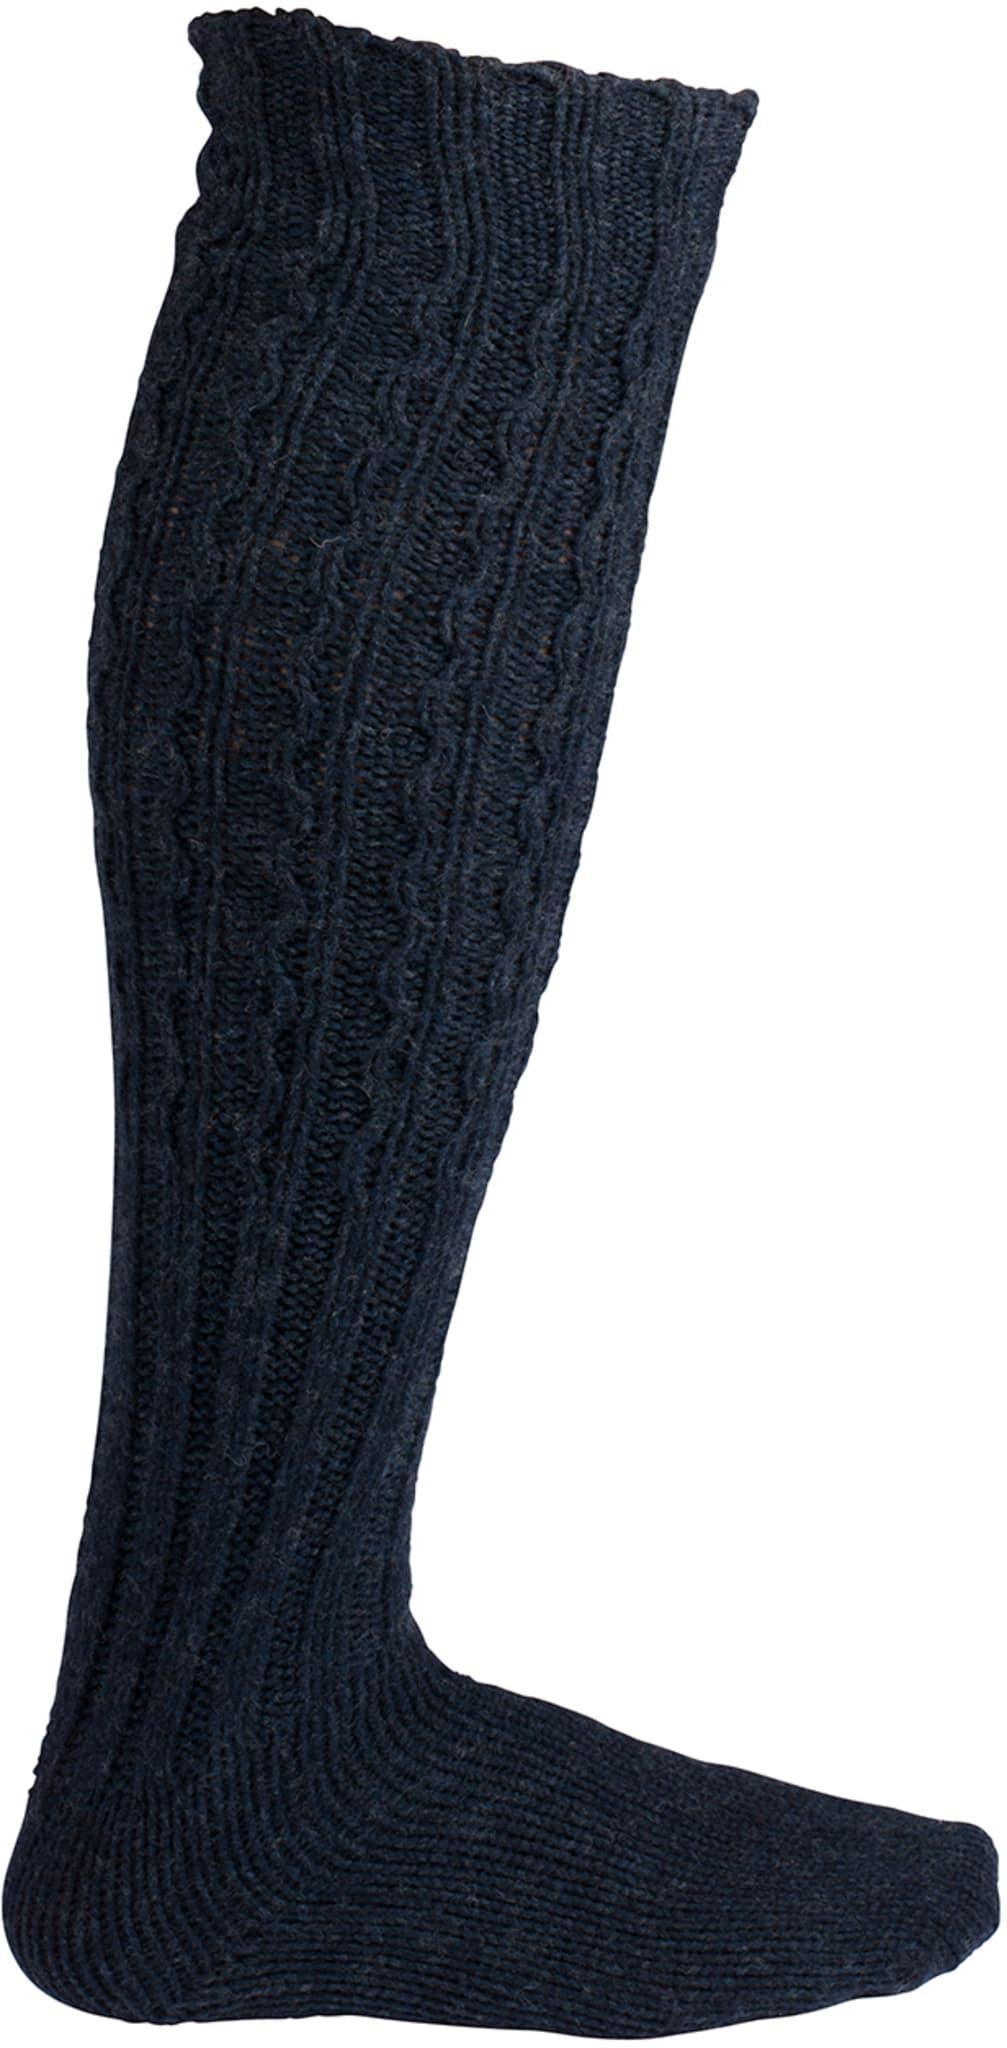 Traditional Sock